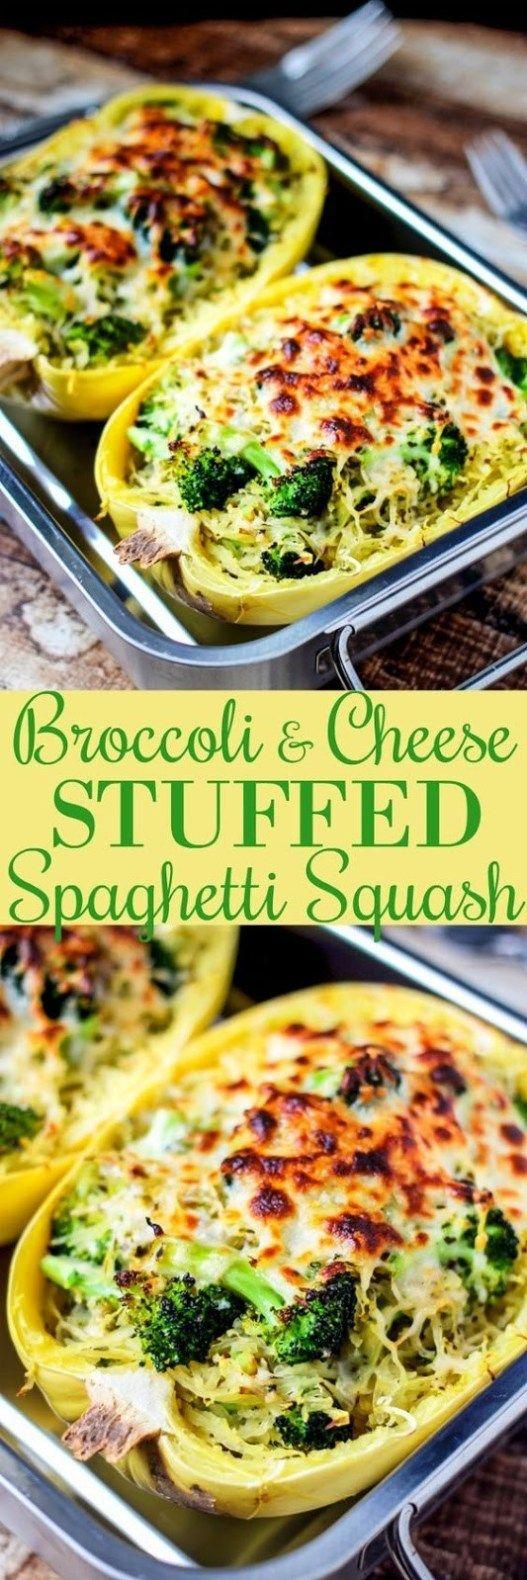 Broccoli & Cheese Stuffed Spaghetti Squash Recipe - Girls Pop-Dishes #stuffedspaghettisquash